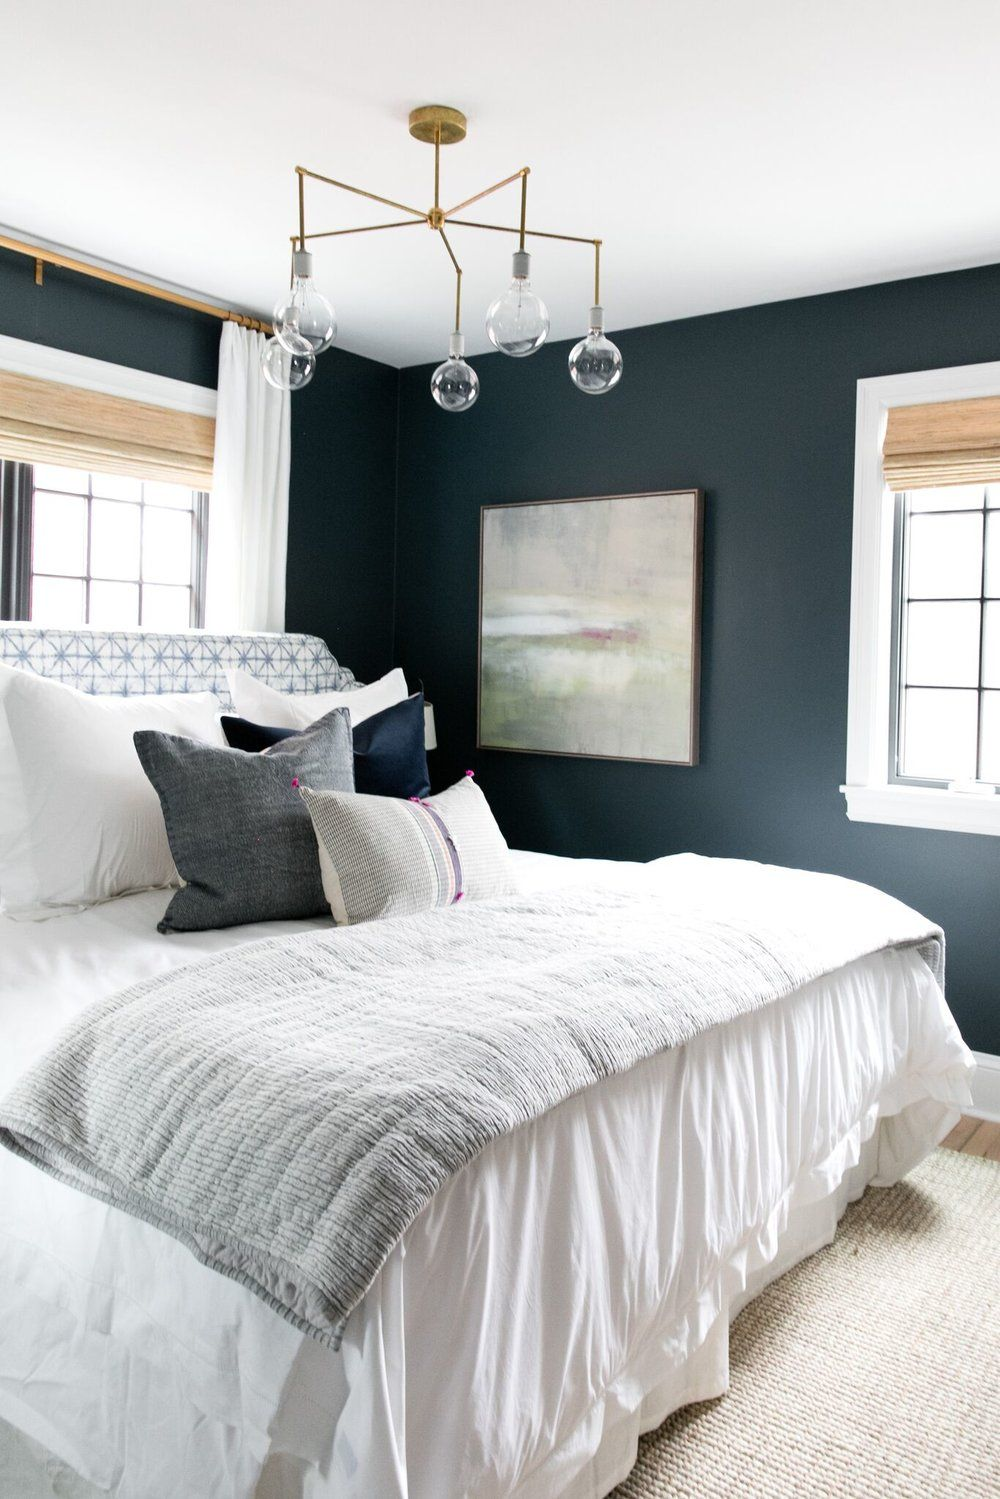 Denver Tudor Reveal  Blue Green Bedrooms Green Bedrooms And Blue Unique Bedrooms And More Decorating Design